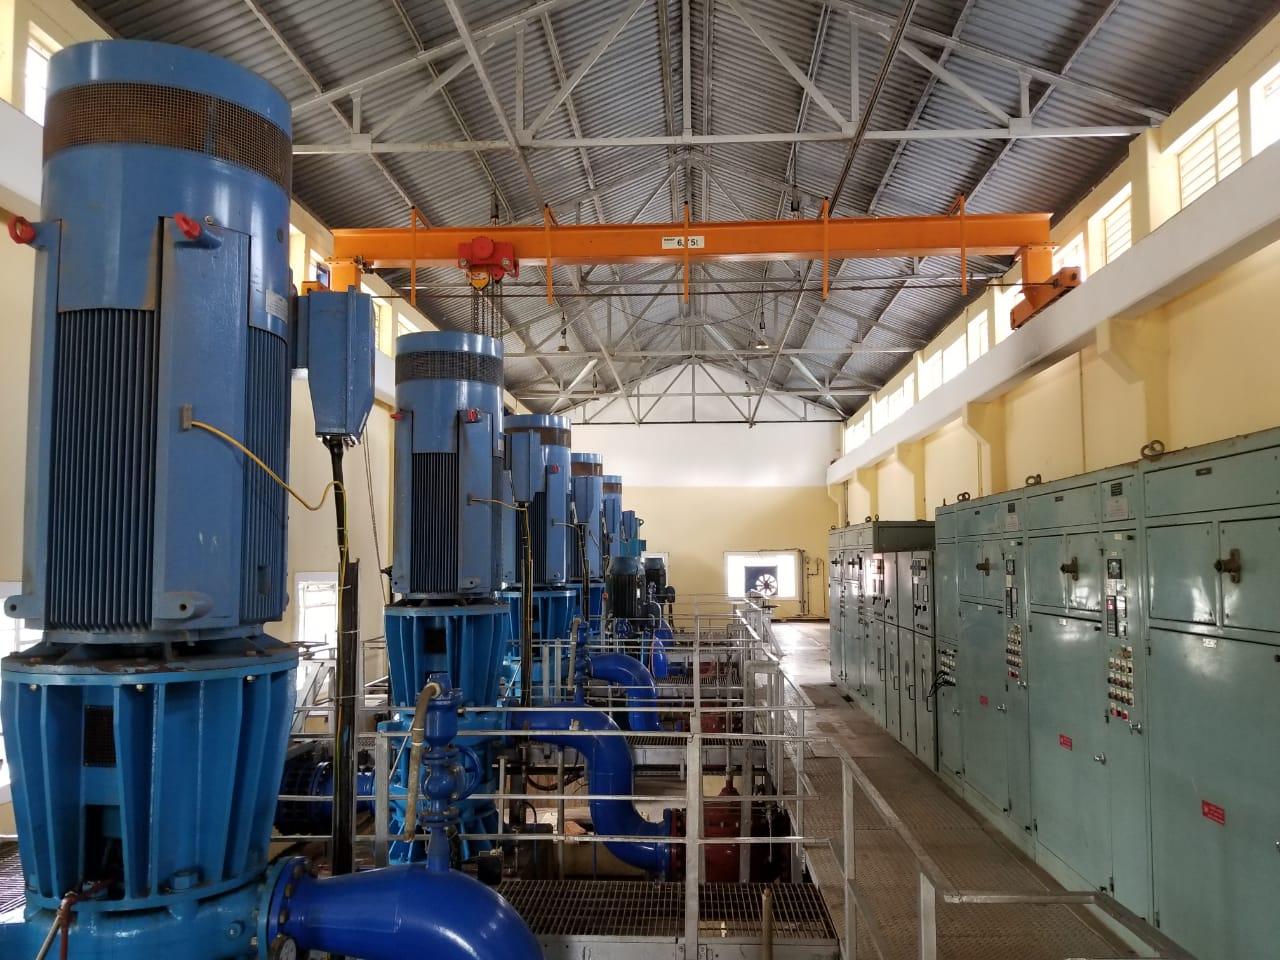 1. Electromechanical Installations at Ba